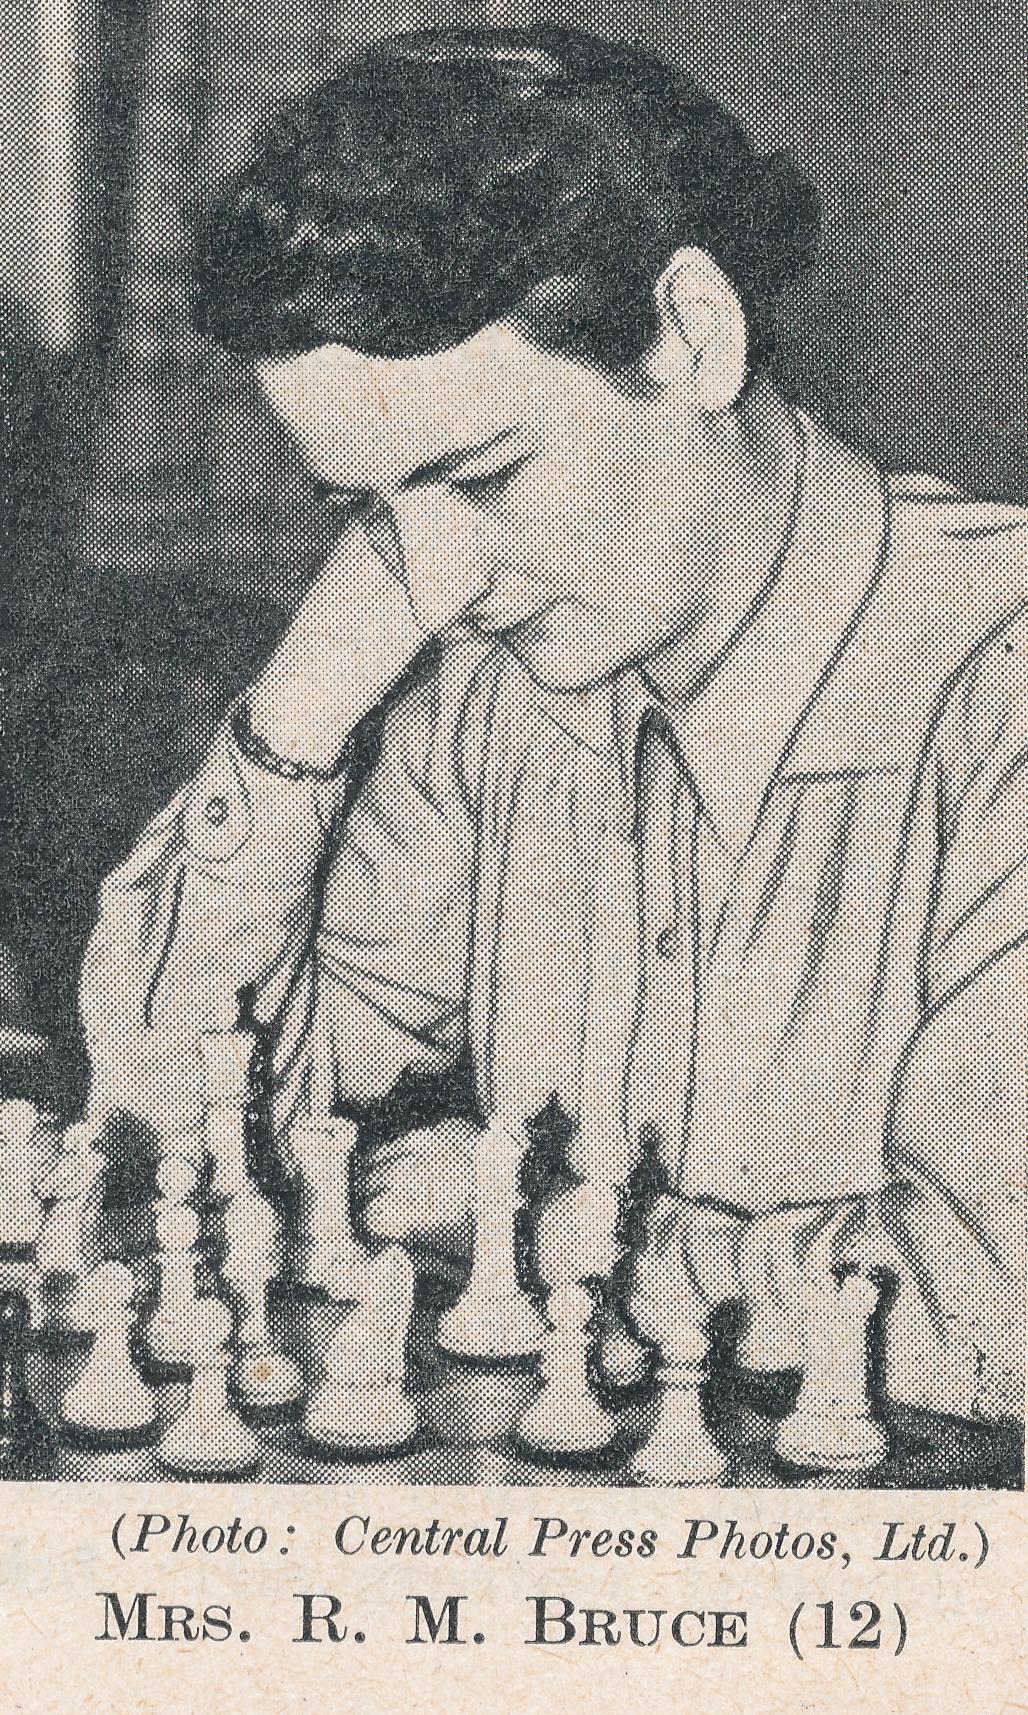 WIM Rowena Bruce (15-v-1919 24-ix-1999). Source : The Anglo-Soviet Radio Chess Match.